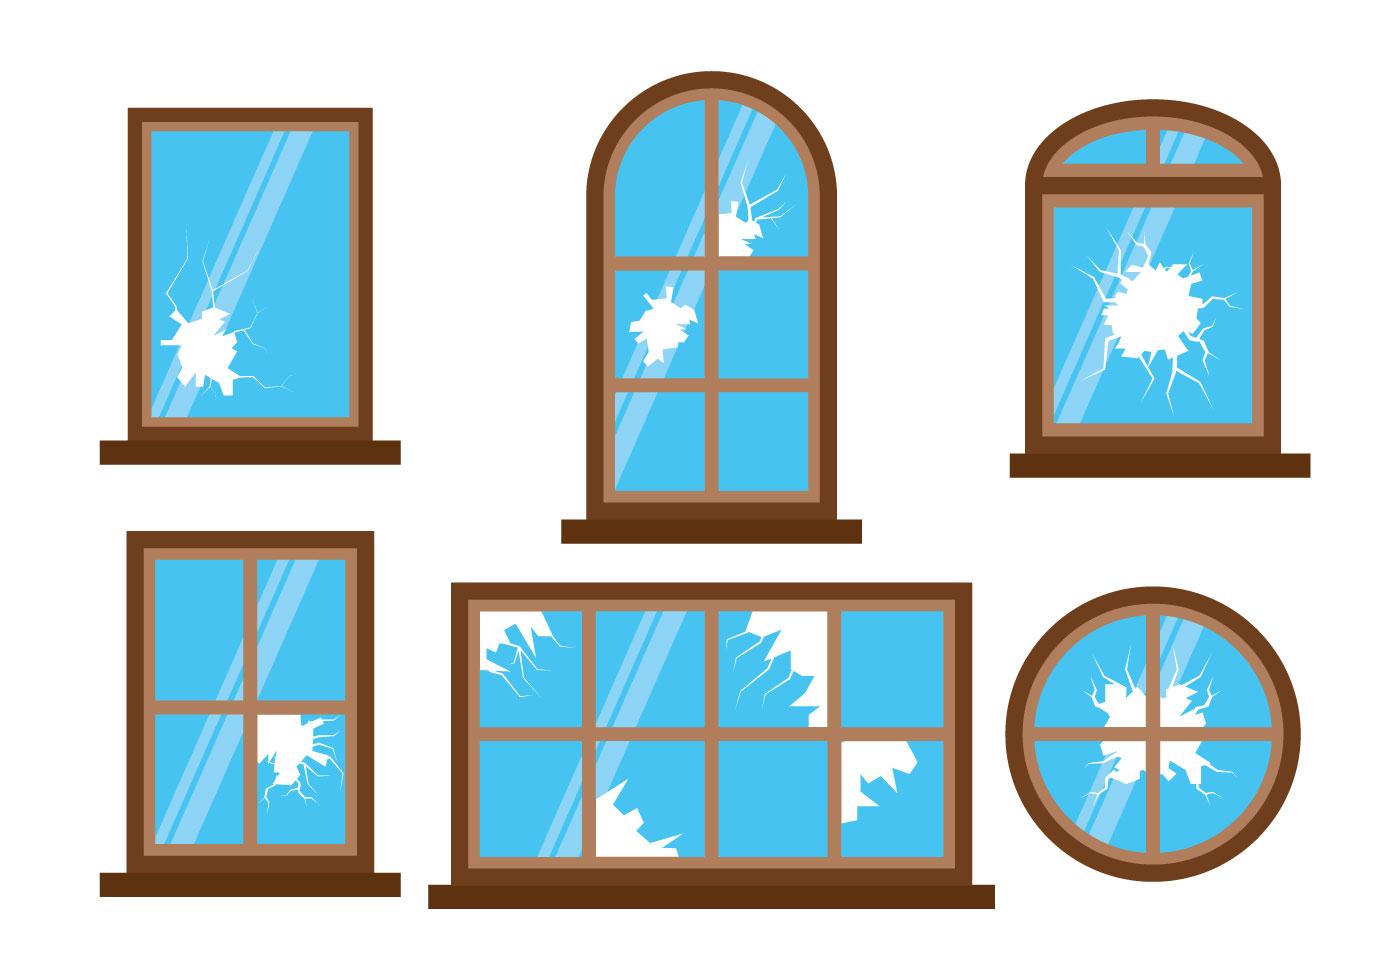 broken window vector download free vector art  stock firehouse clipart free Court Clip Art